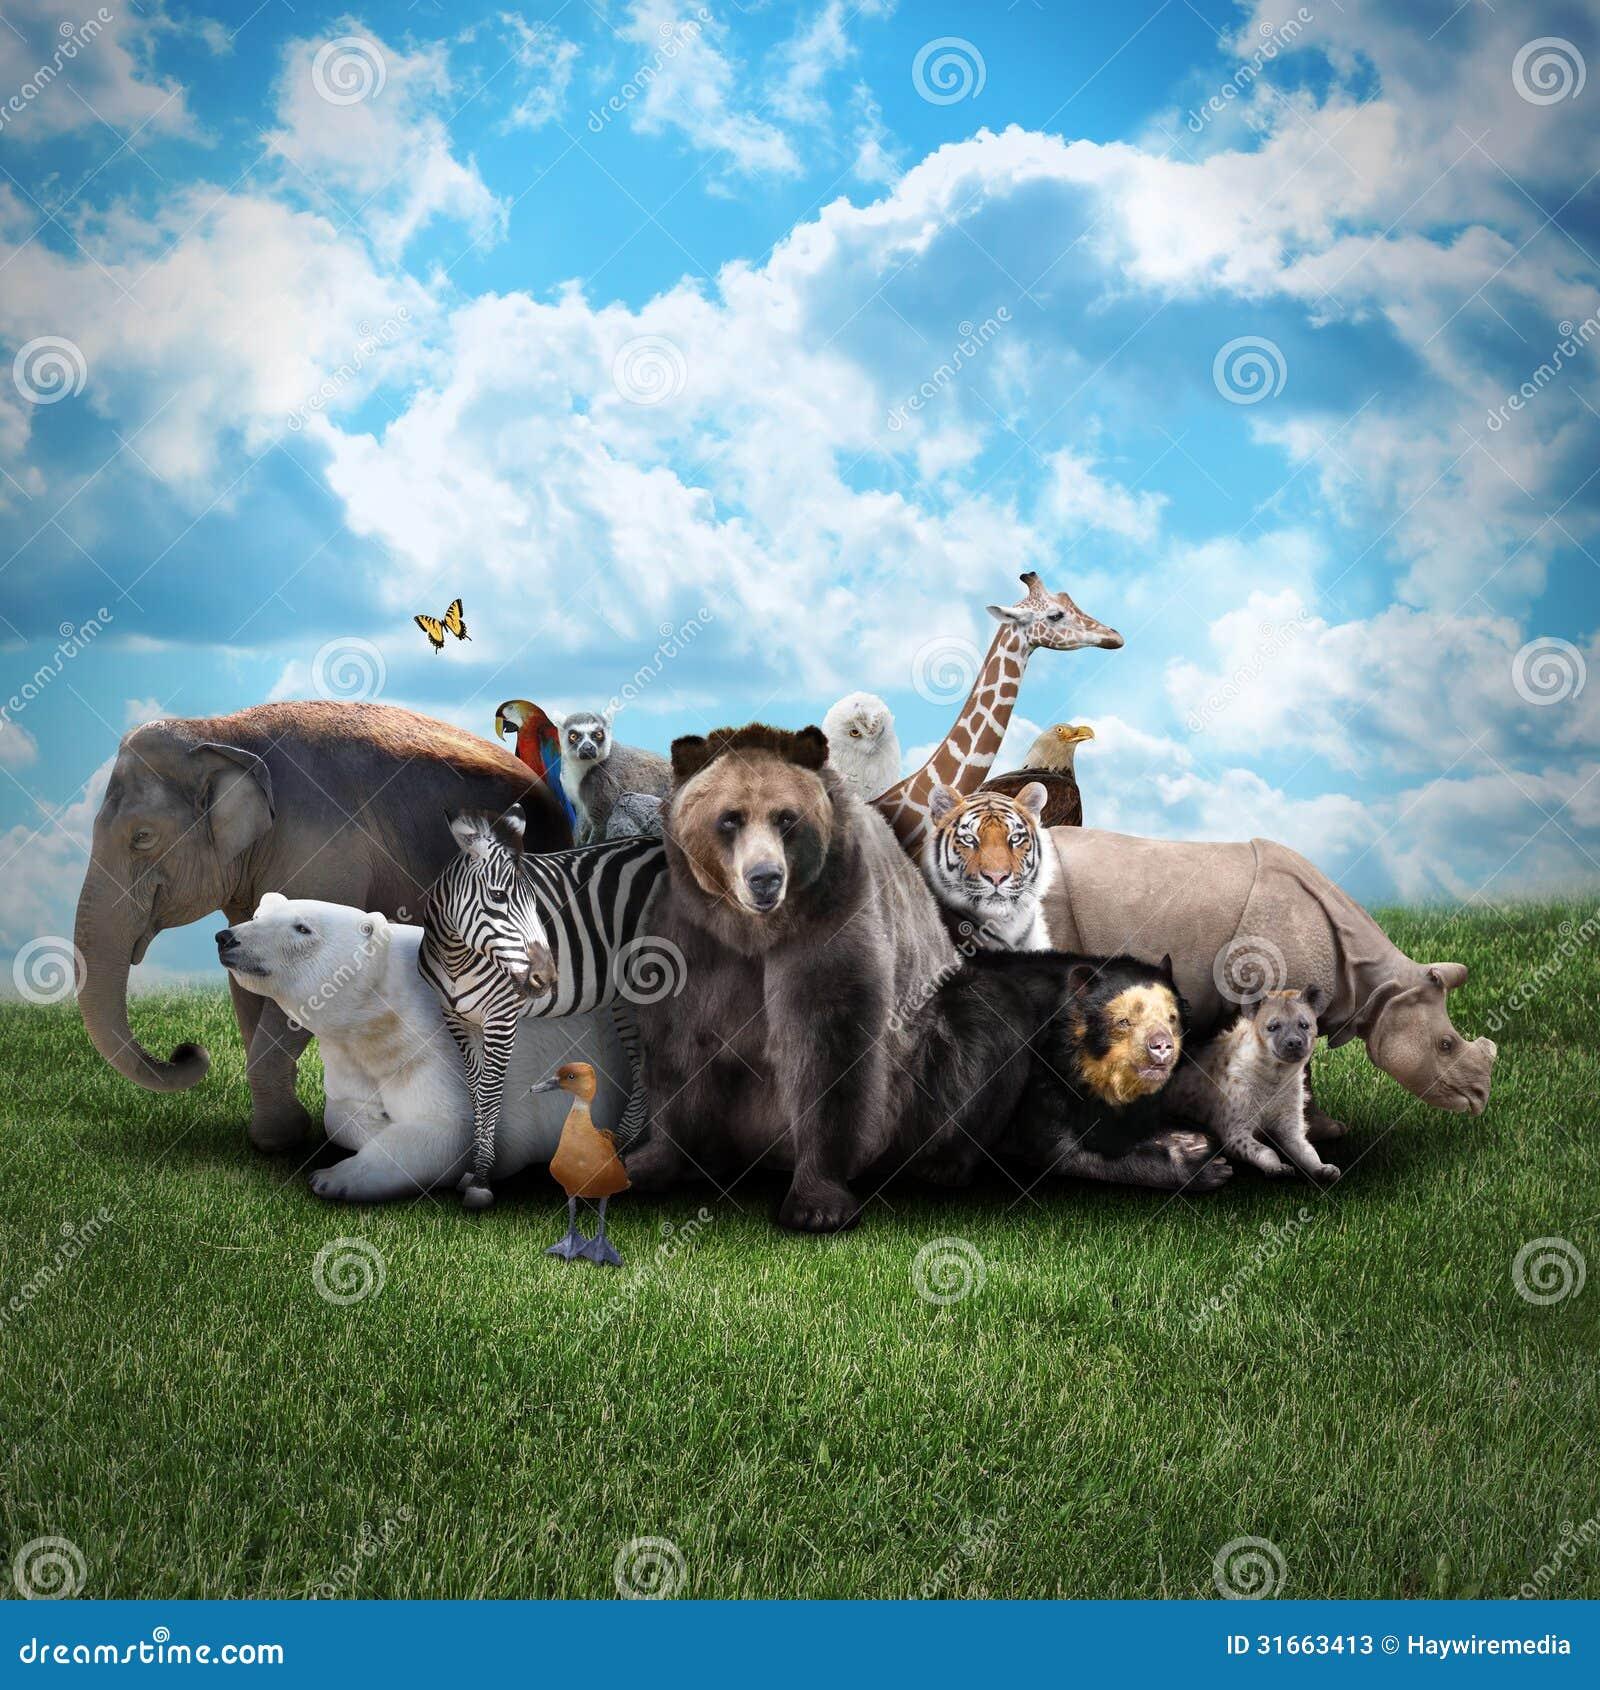 43dac7bf3c838 Zoo Animals On Nature Background Stock Image - Image of danger ...